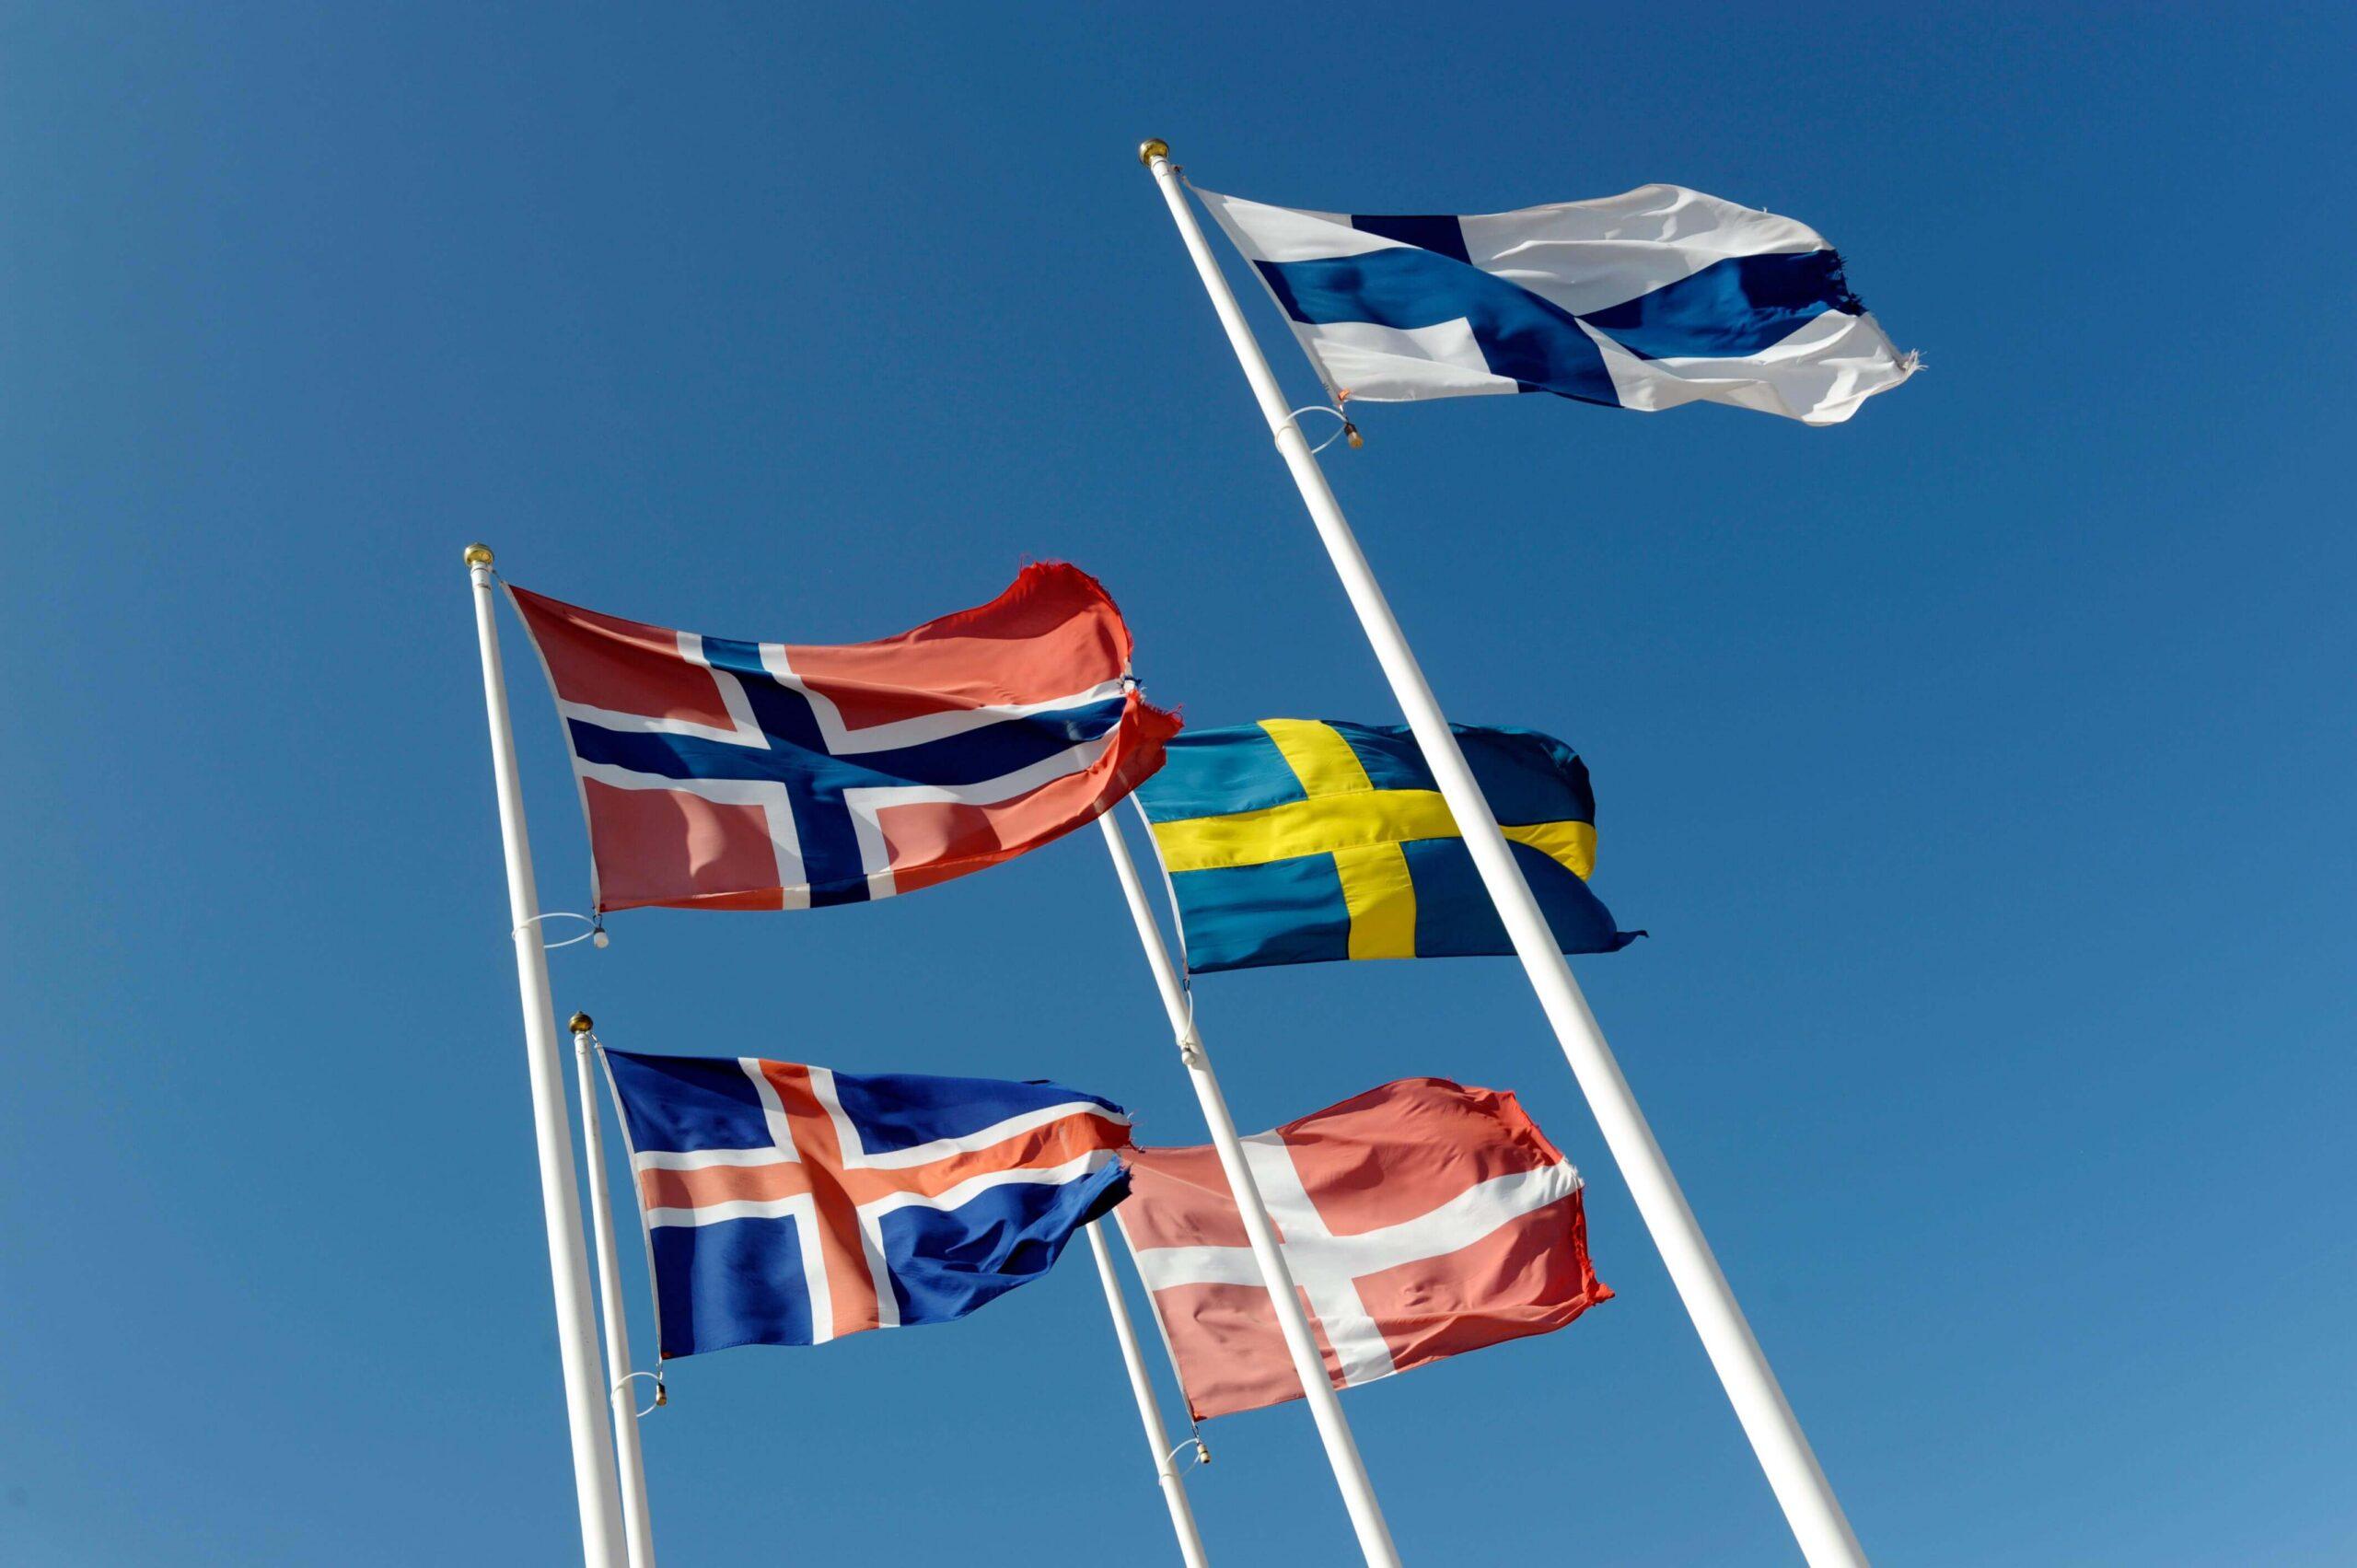 Kvarken council flags